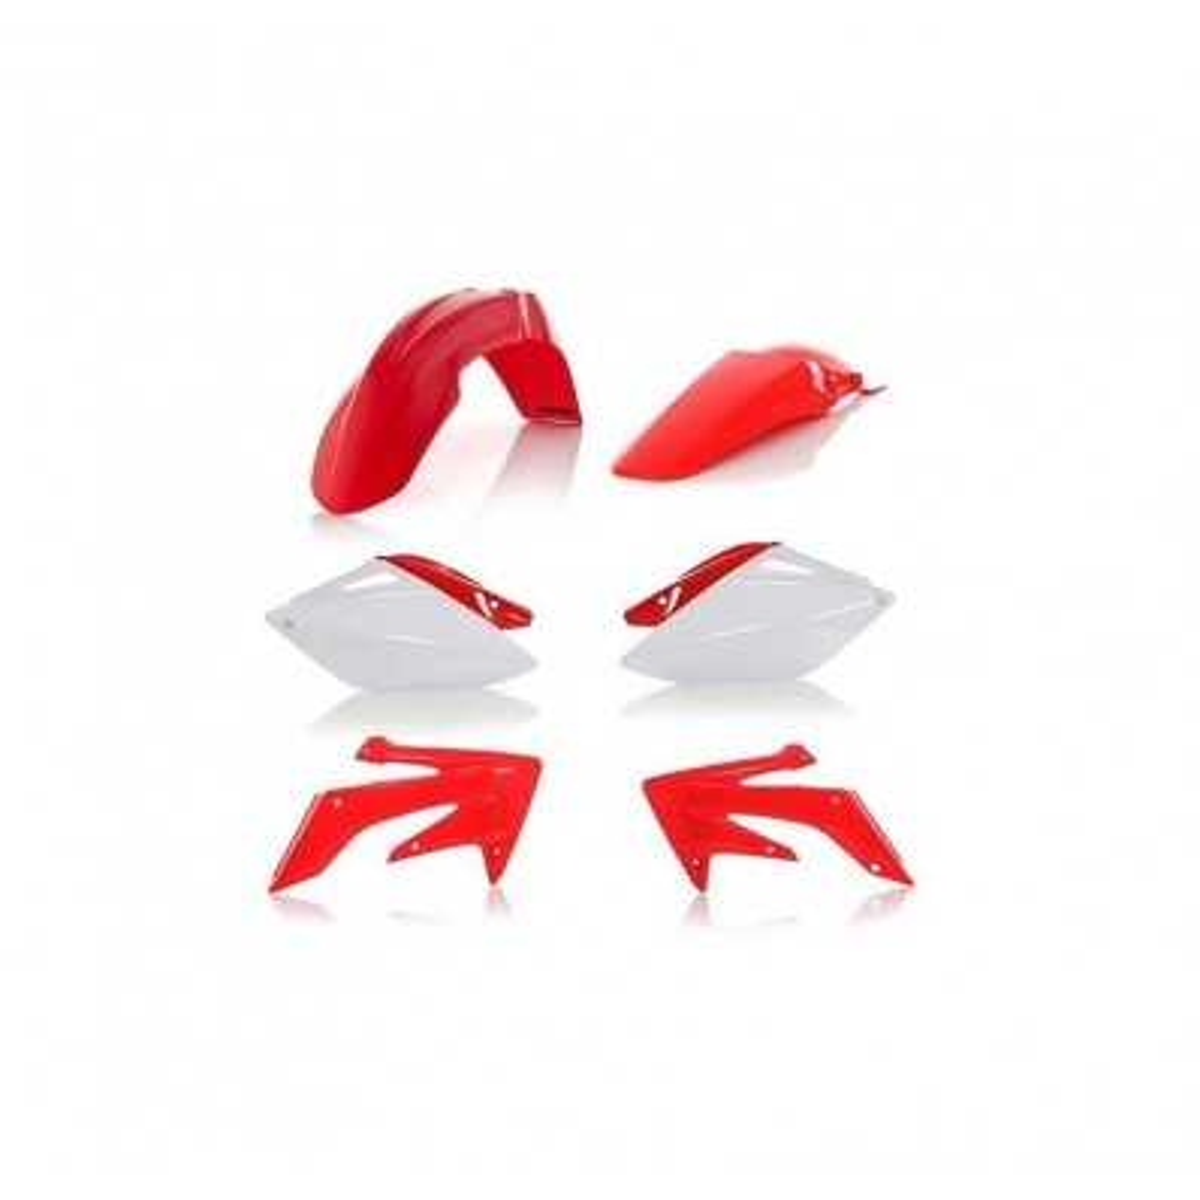 0009177-553 - Kit Plasticos Acerbis Crf 250 06 09 Origen